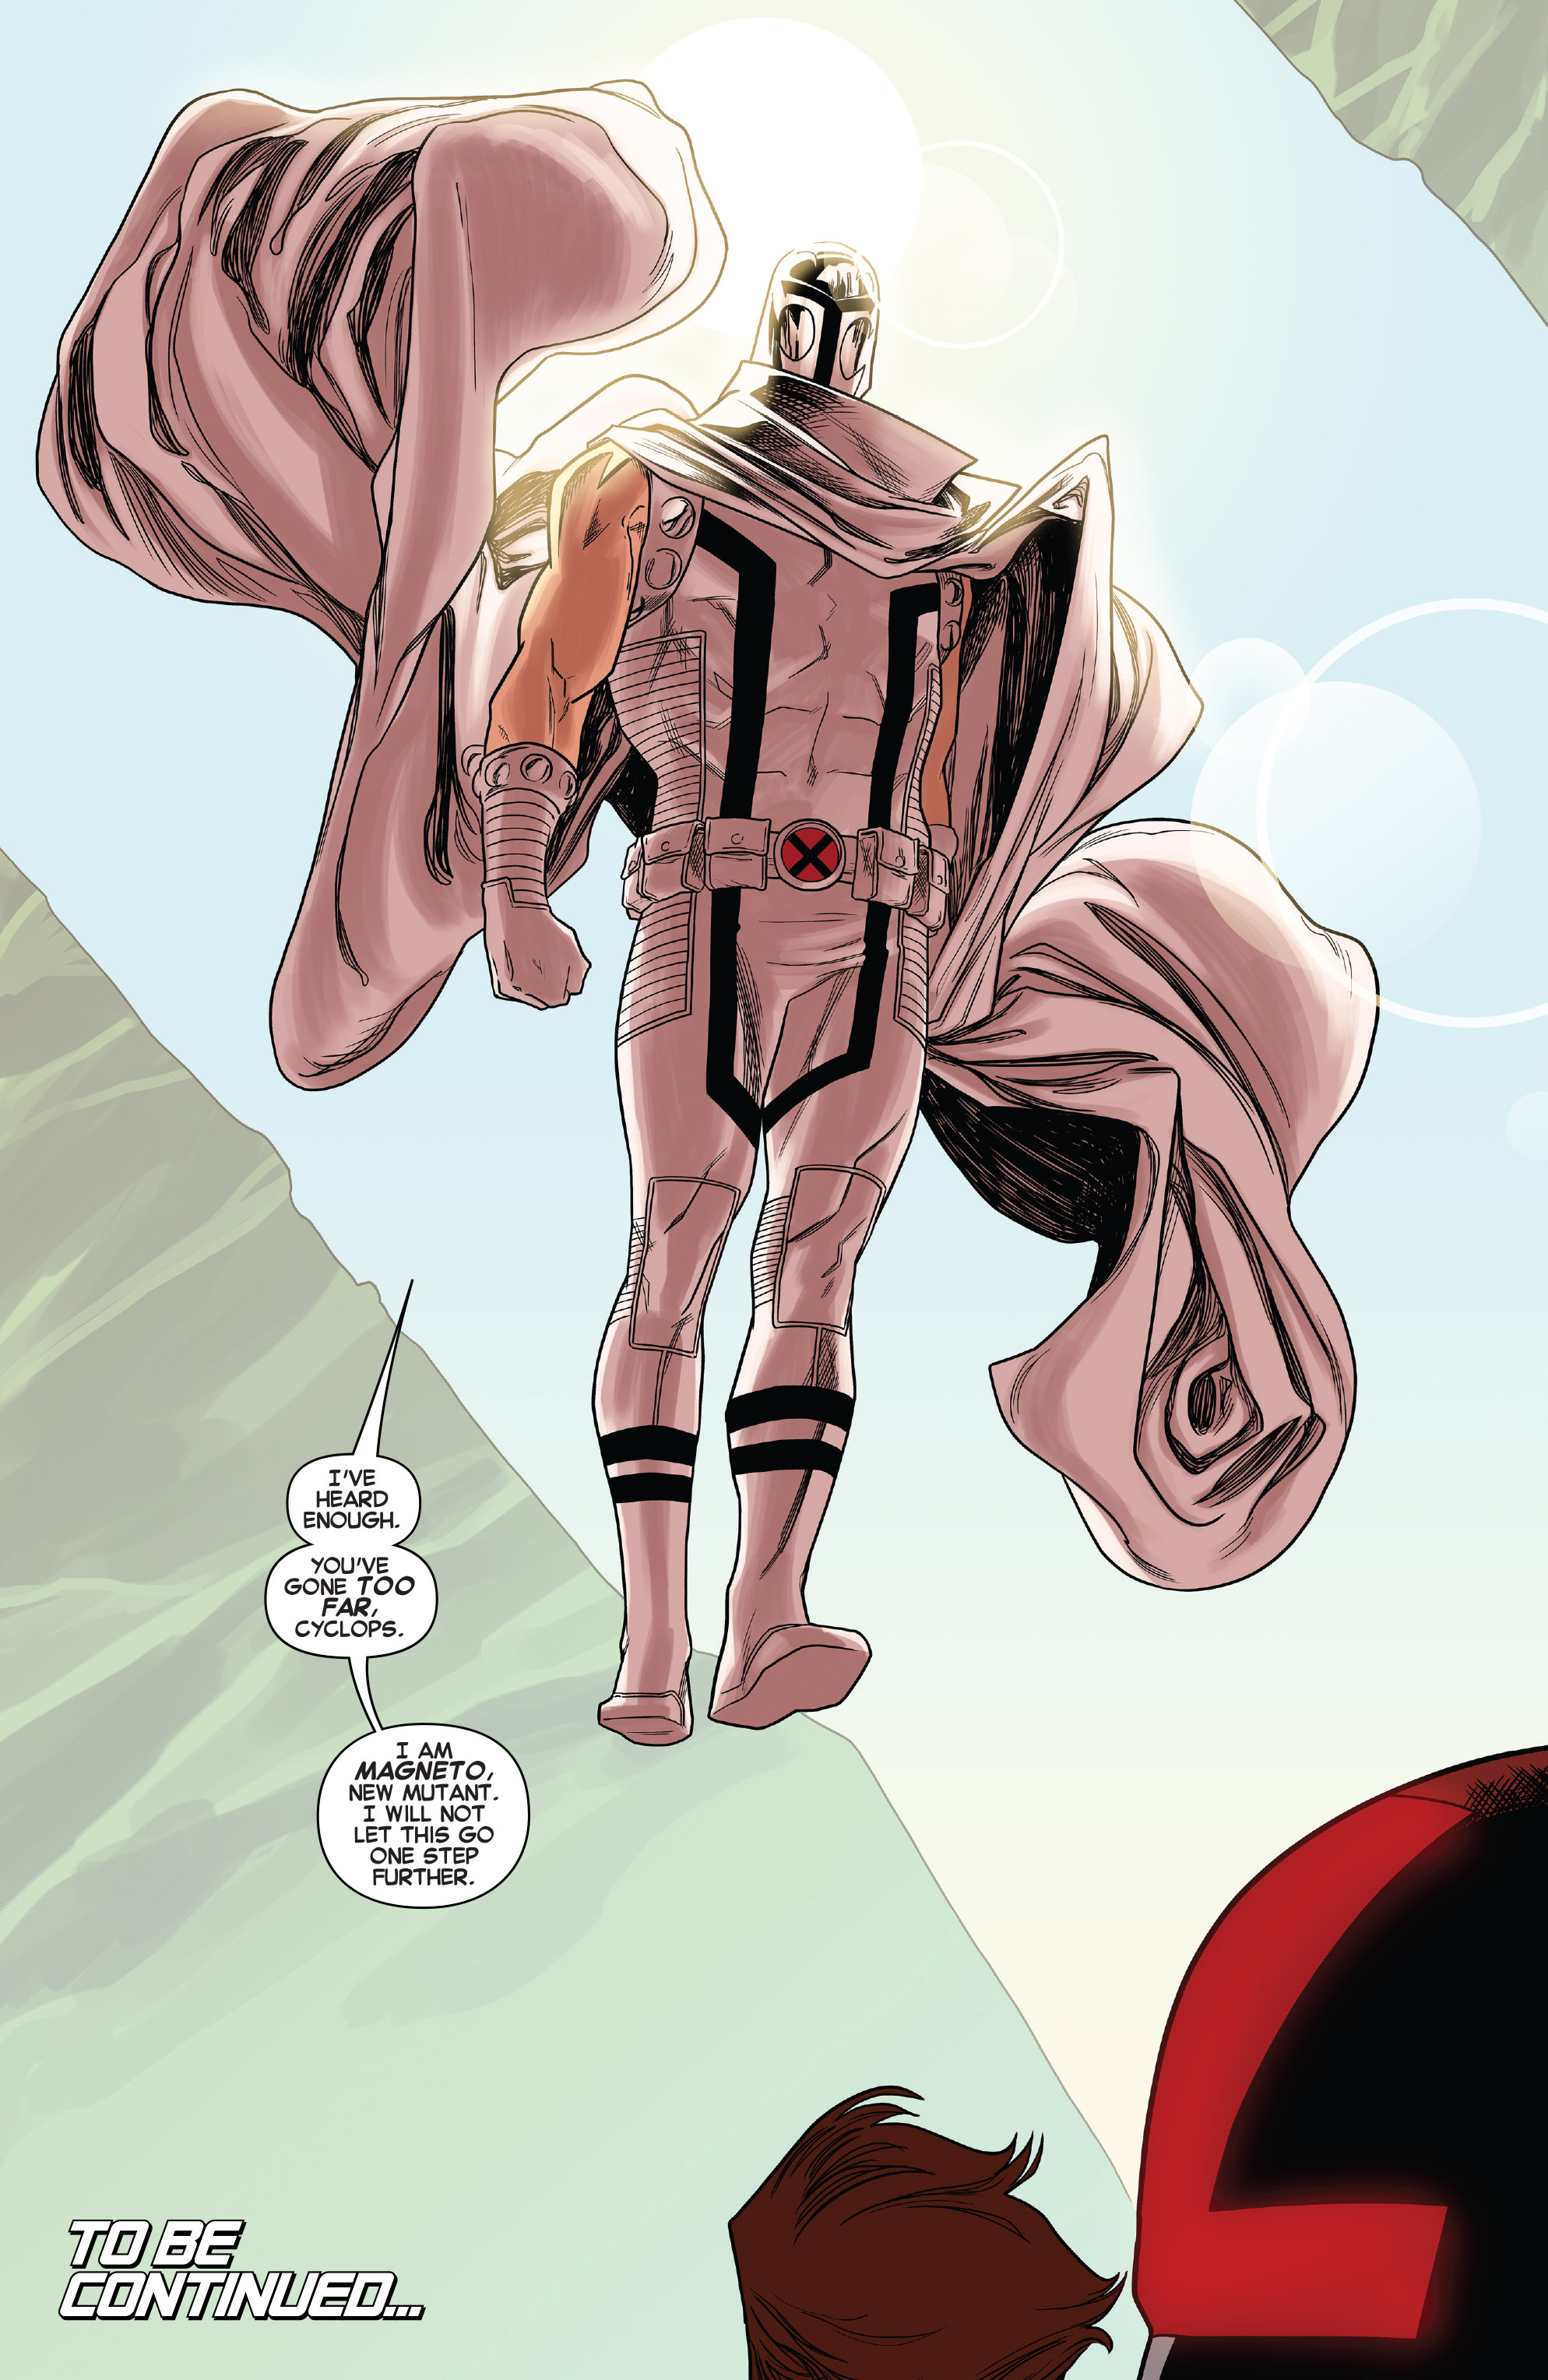 Read online Uncanny X-Men (2013) comic -  Issue # _TPB 5 - The Omega Mutant - 55